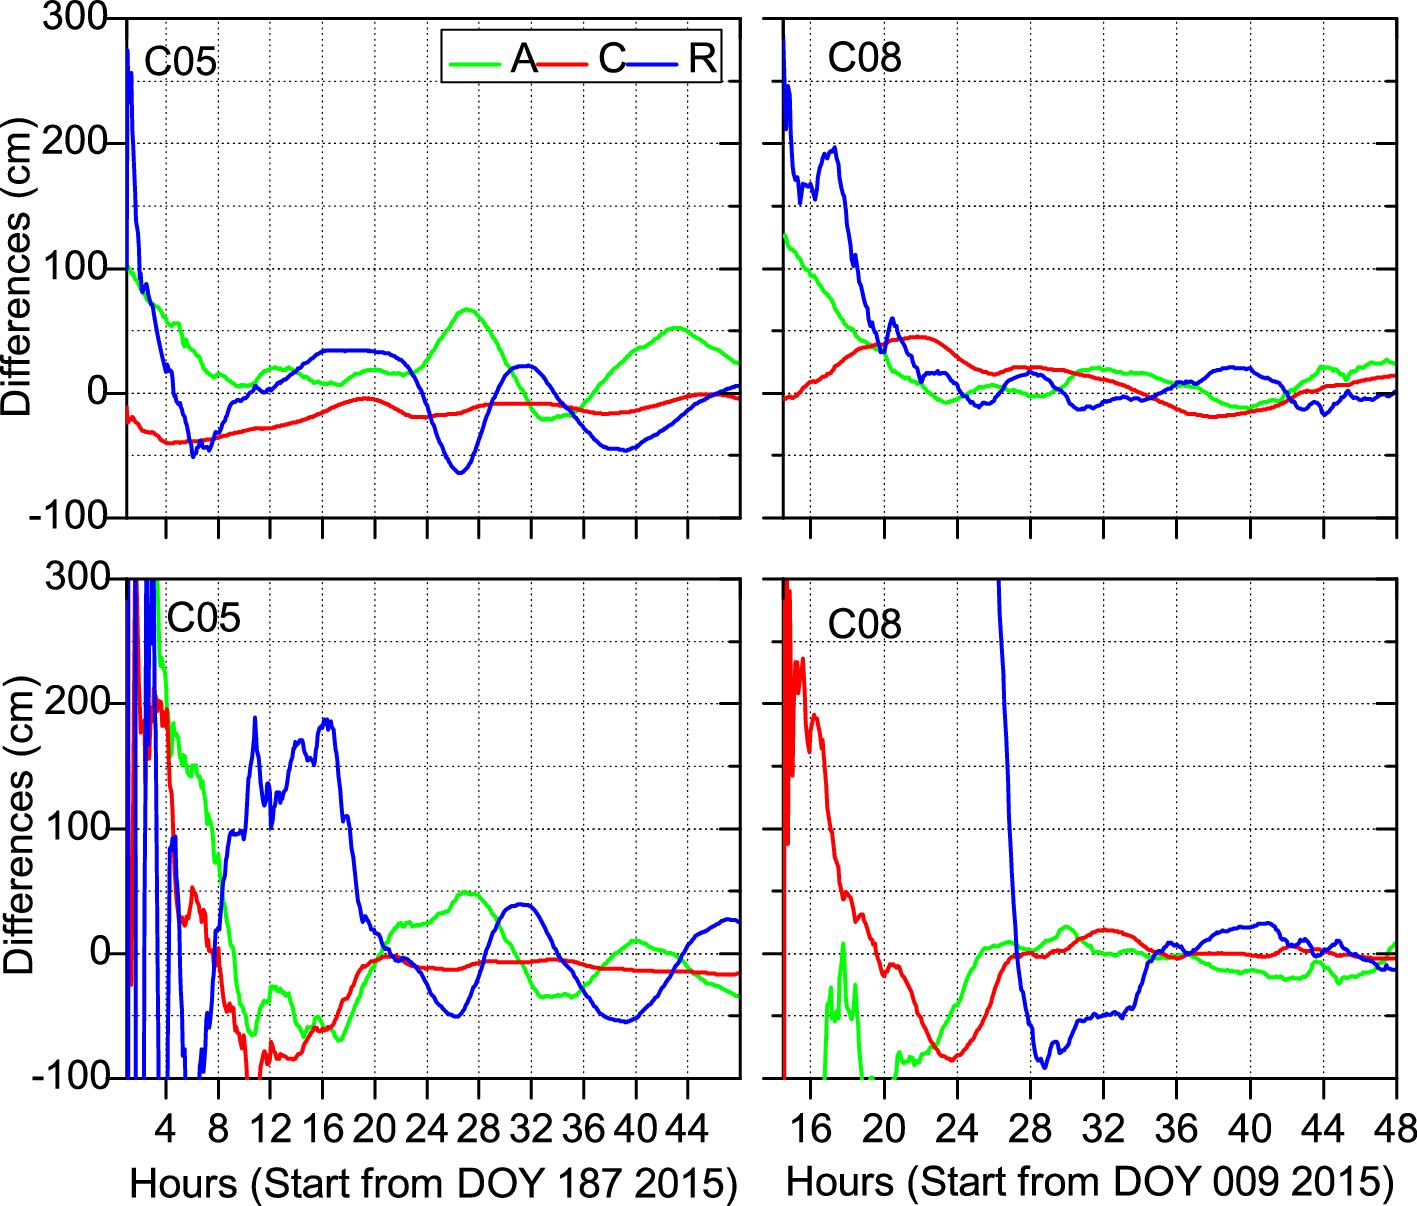 Real-time precise orbit determination for BDS satellites